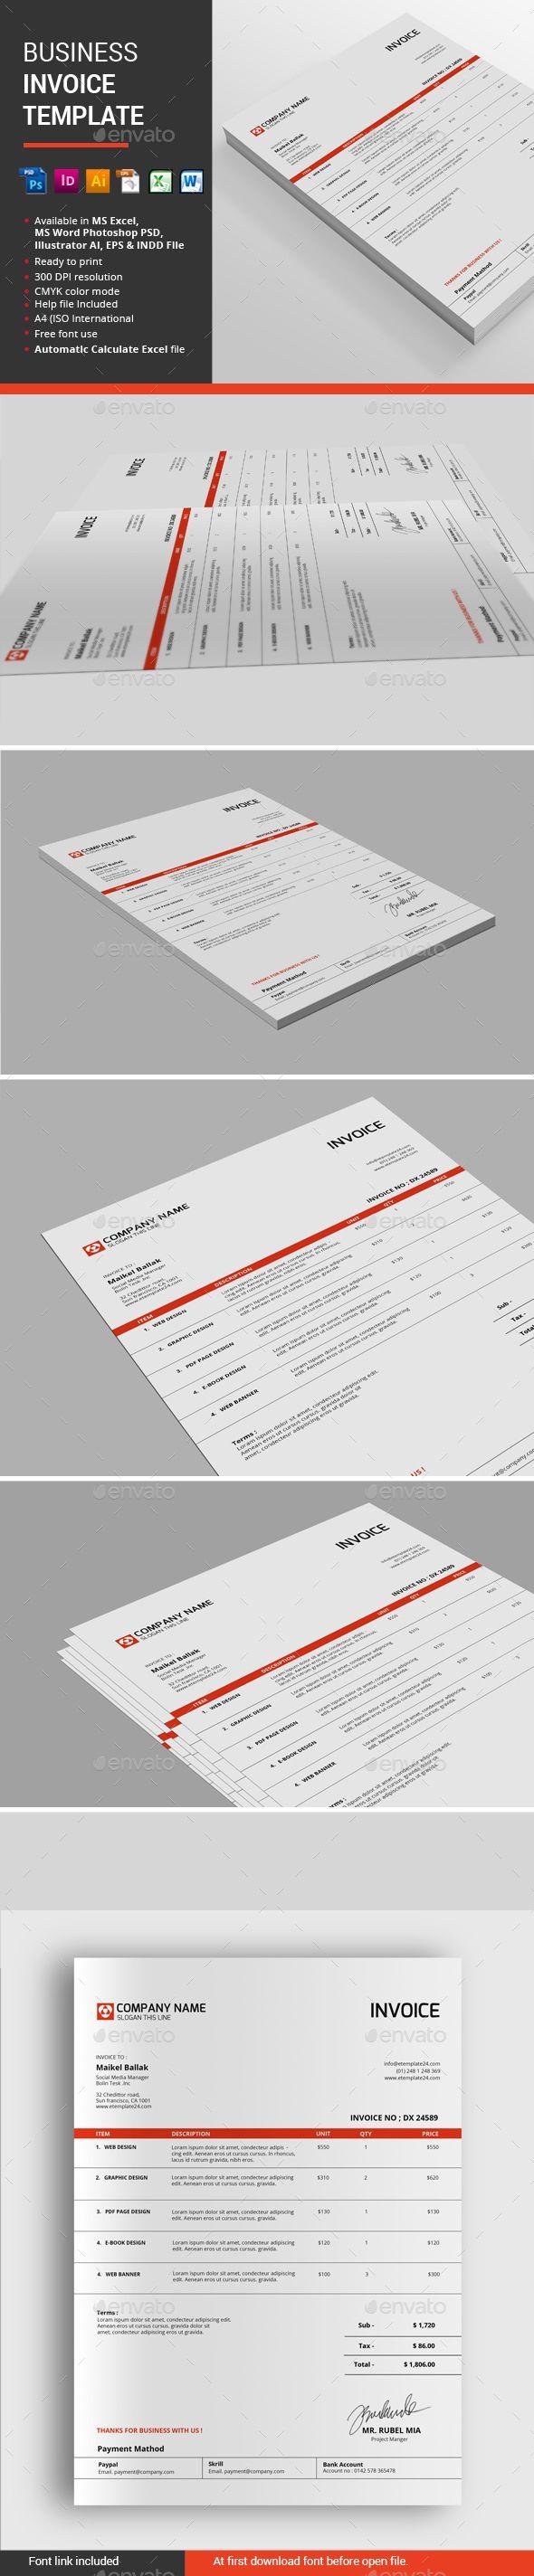 Business Invoice Template | Empresas